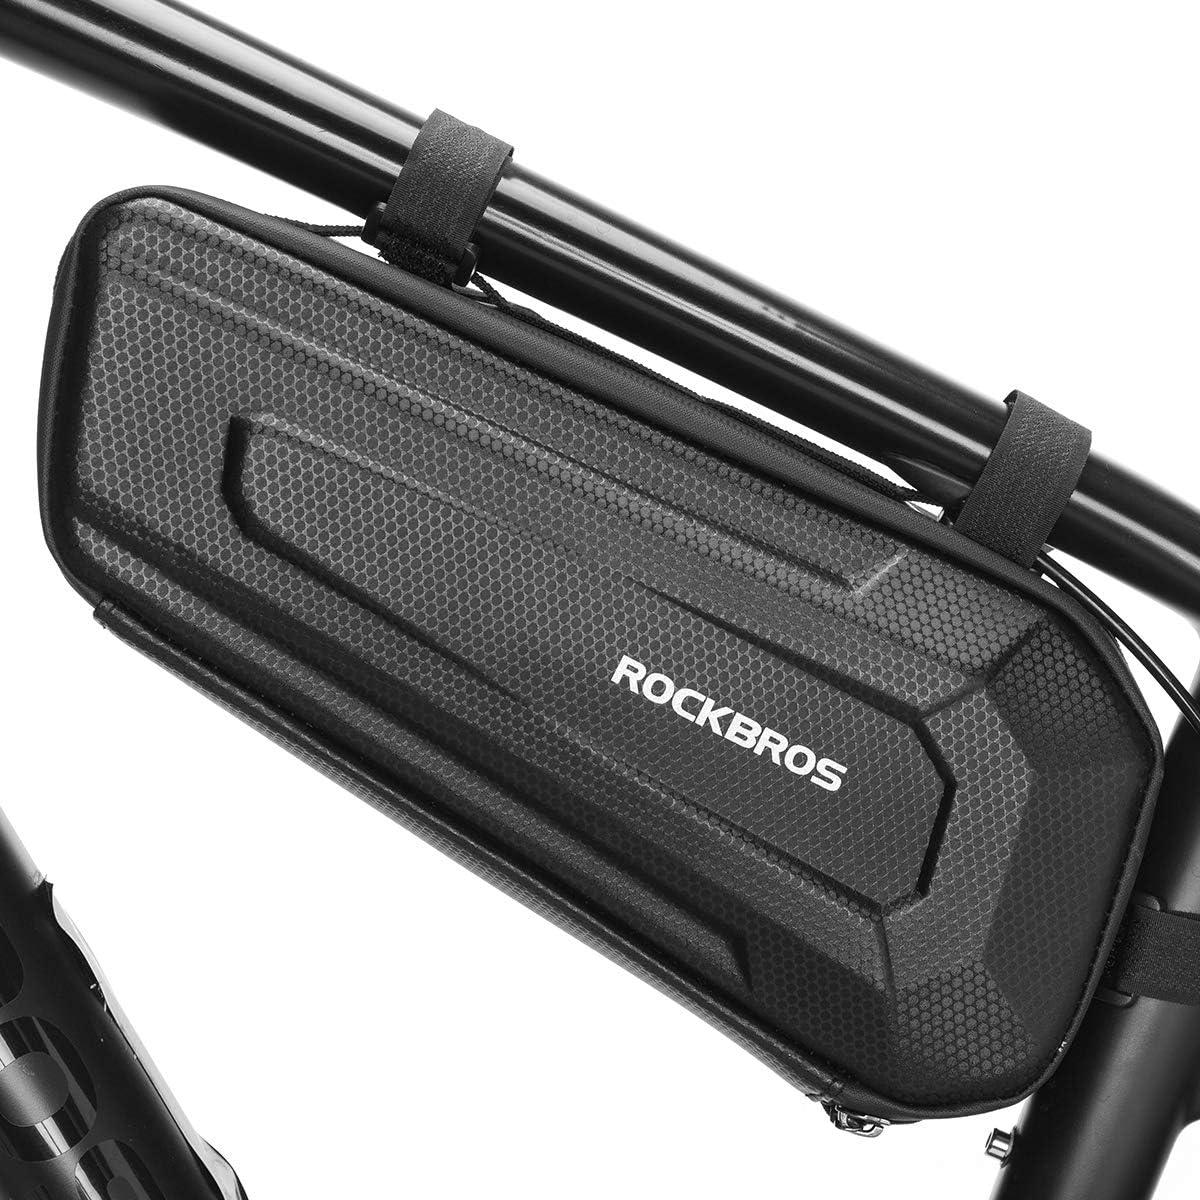 ROCKBROS Bike Frame Bag Bike Storage Triangle Bag Bicycle Under Top Tube Saddle Bag Water-Resistant EVA Cycling Bike Accessories Pouch for Mountain Road Bike